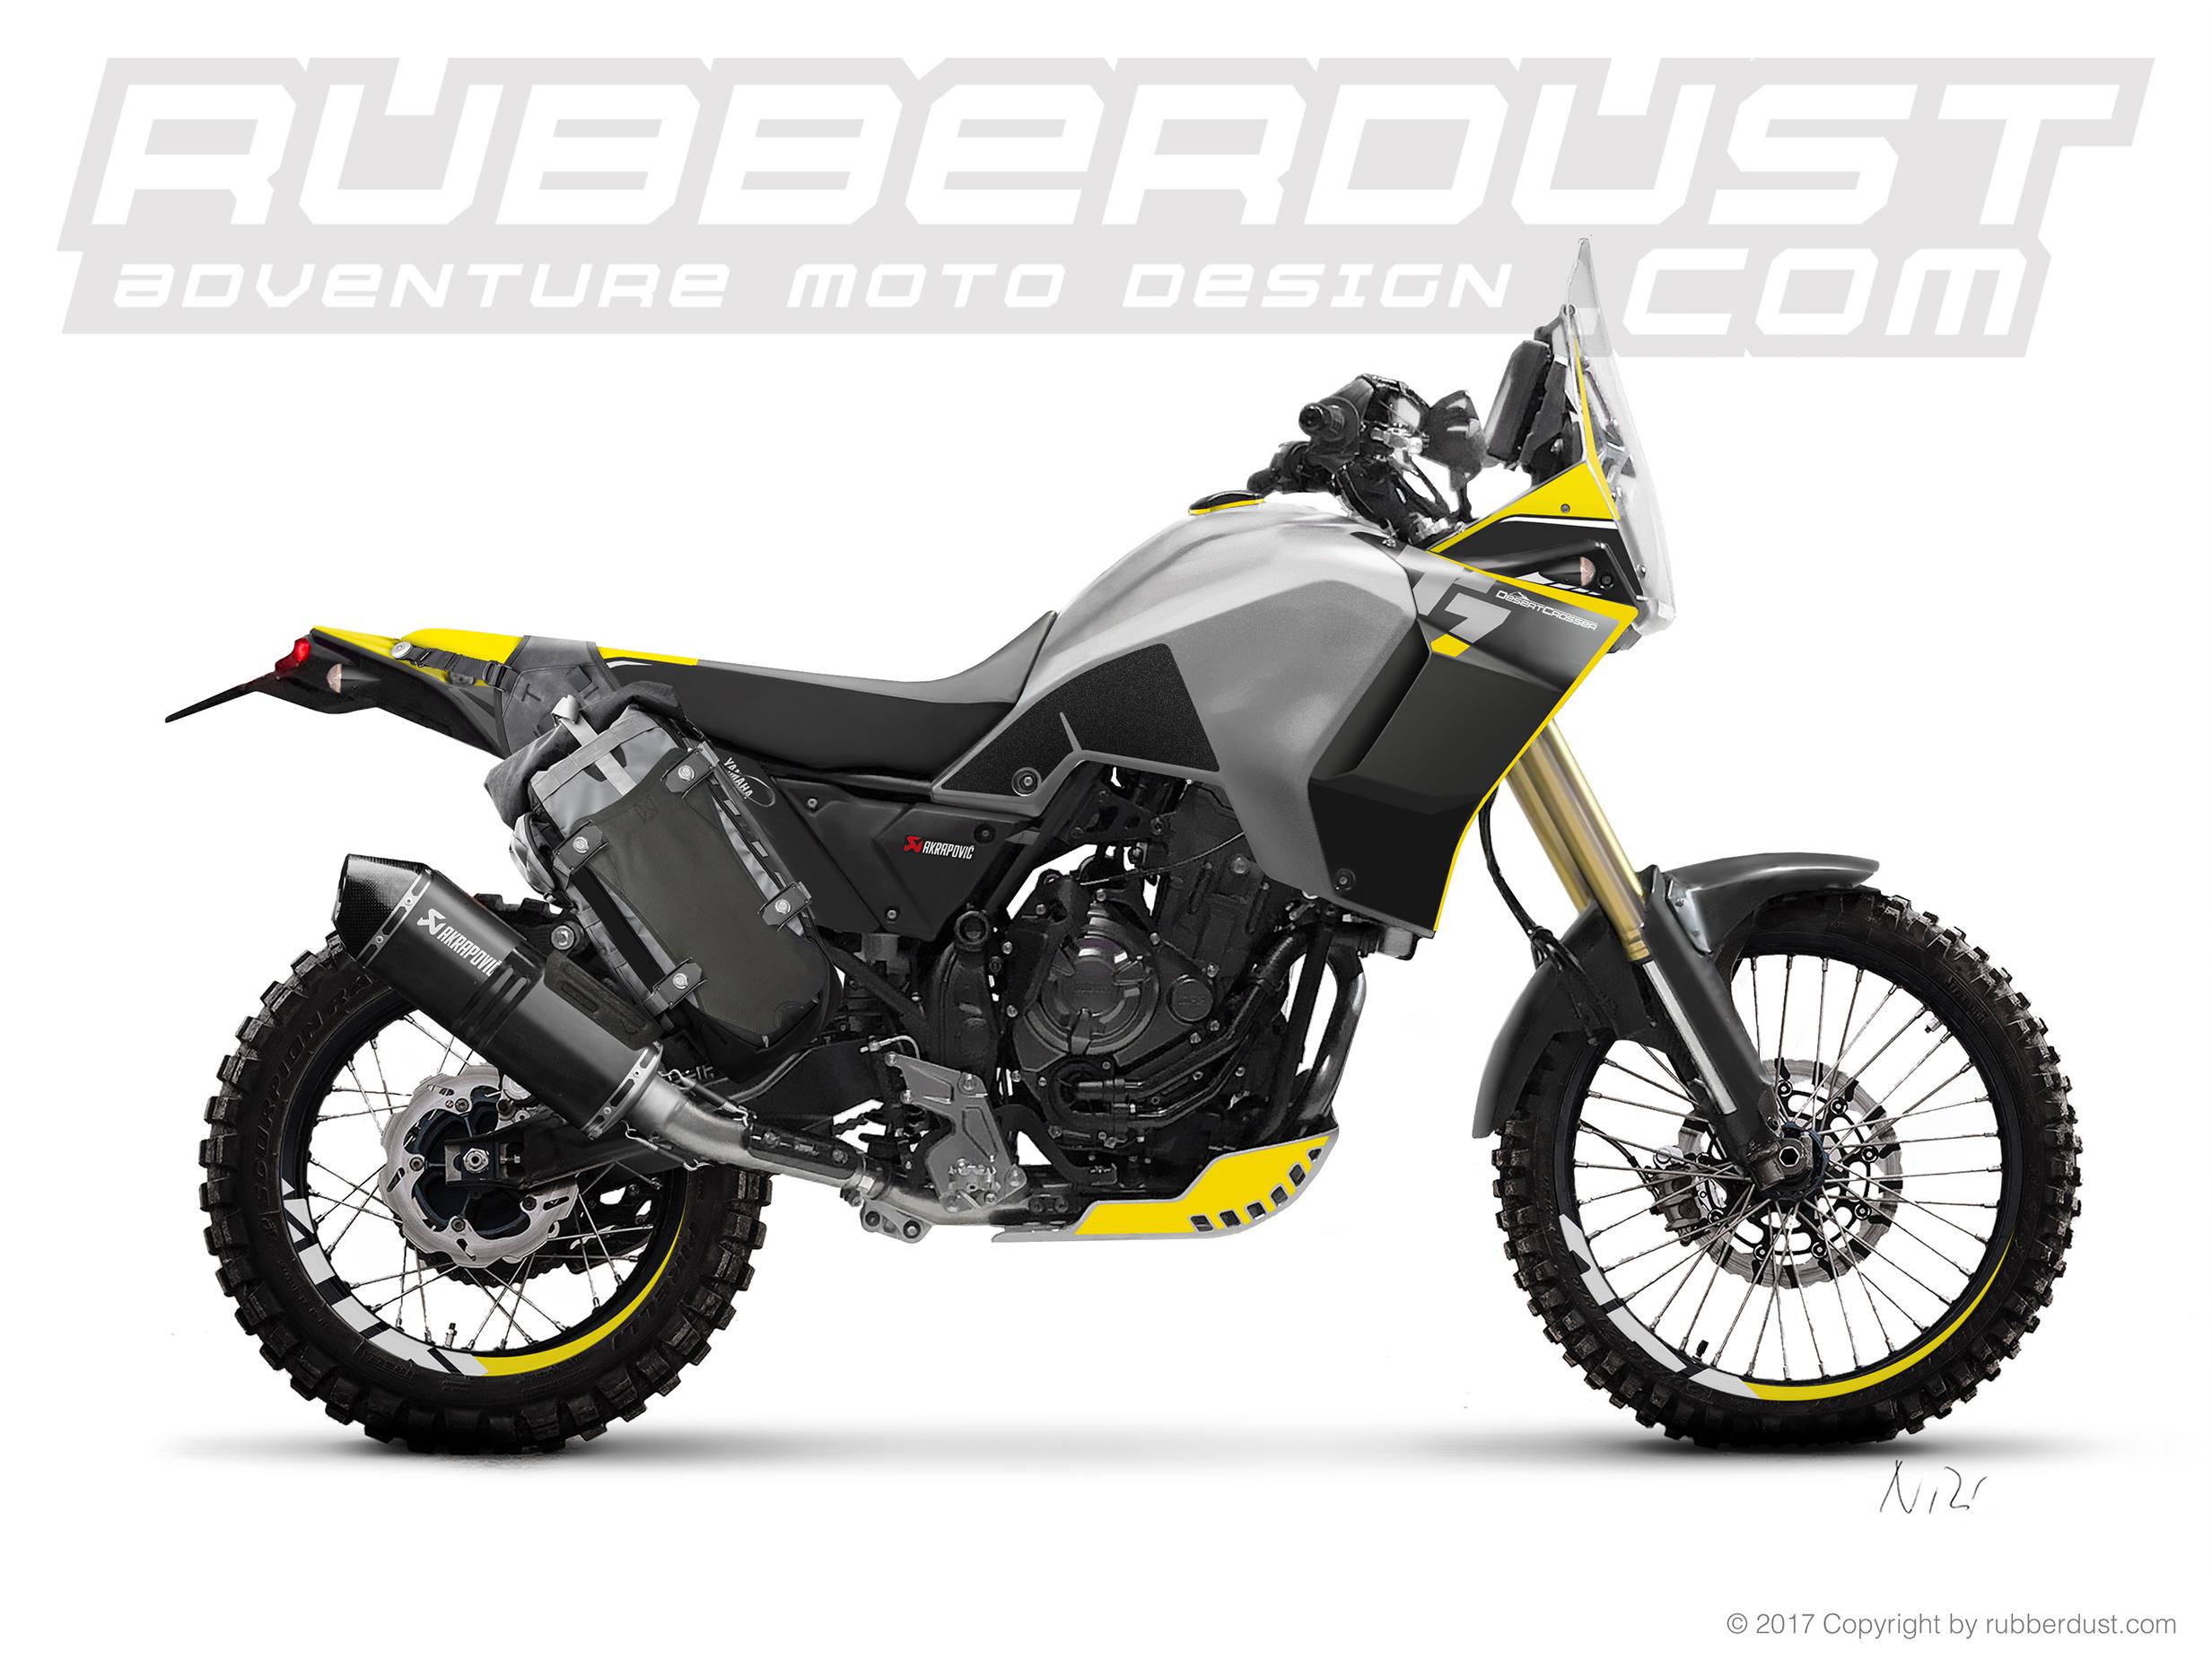 Yamaha T700 T 233 N 233 R 233 Concepts Rubberdust Com